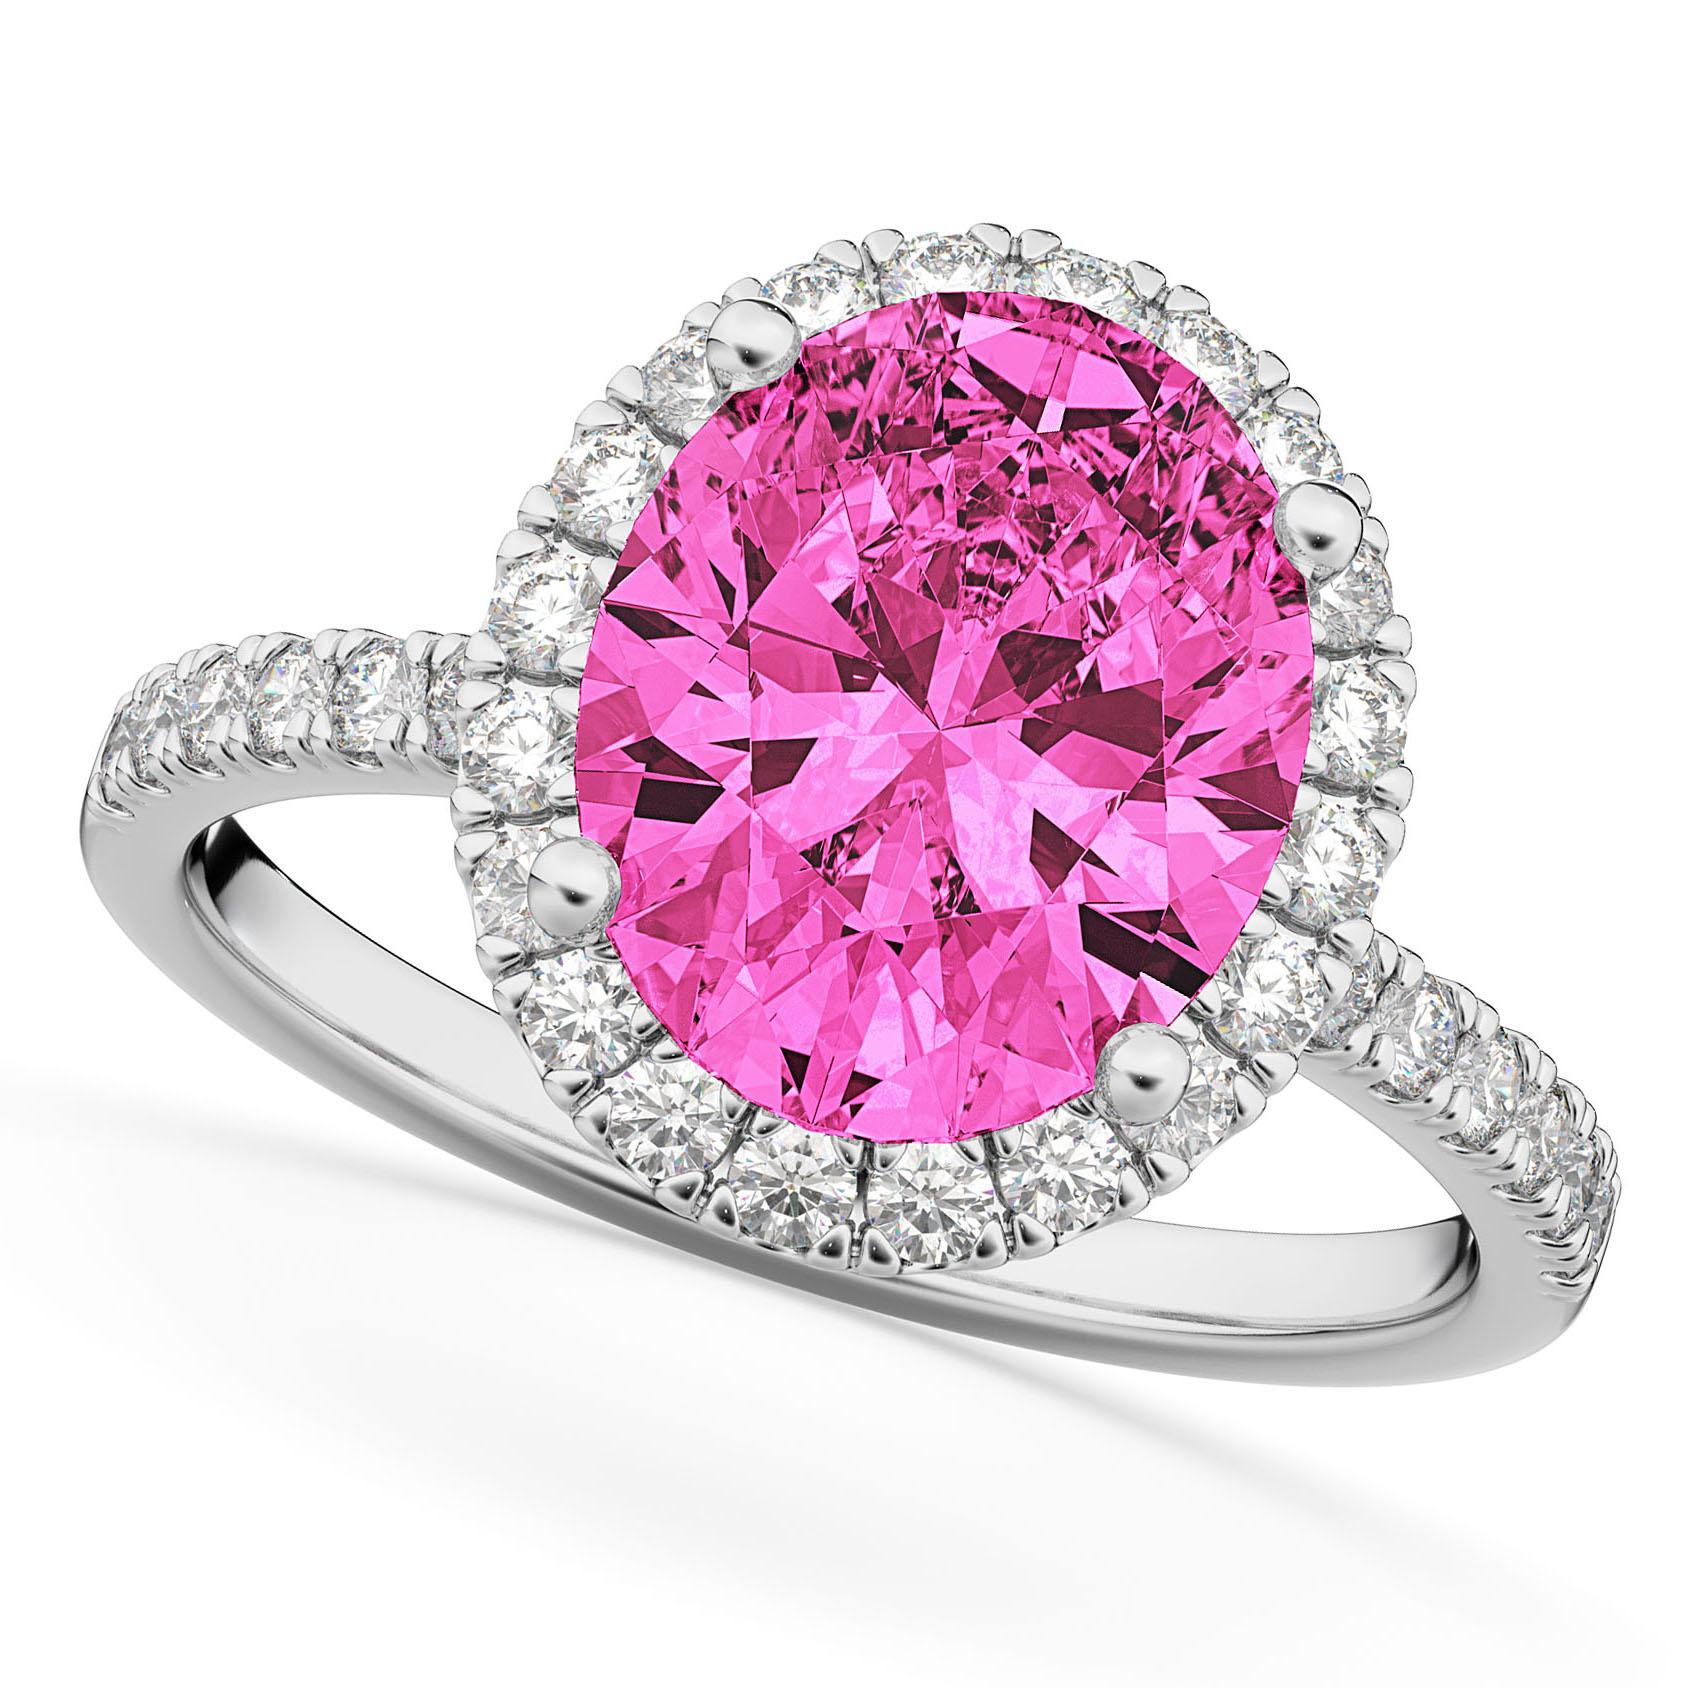 Oval Cut Halo Pink Tourmaline & Diamond Engagement Ring 14K White ...